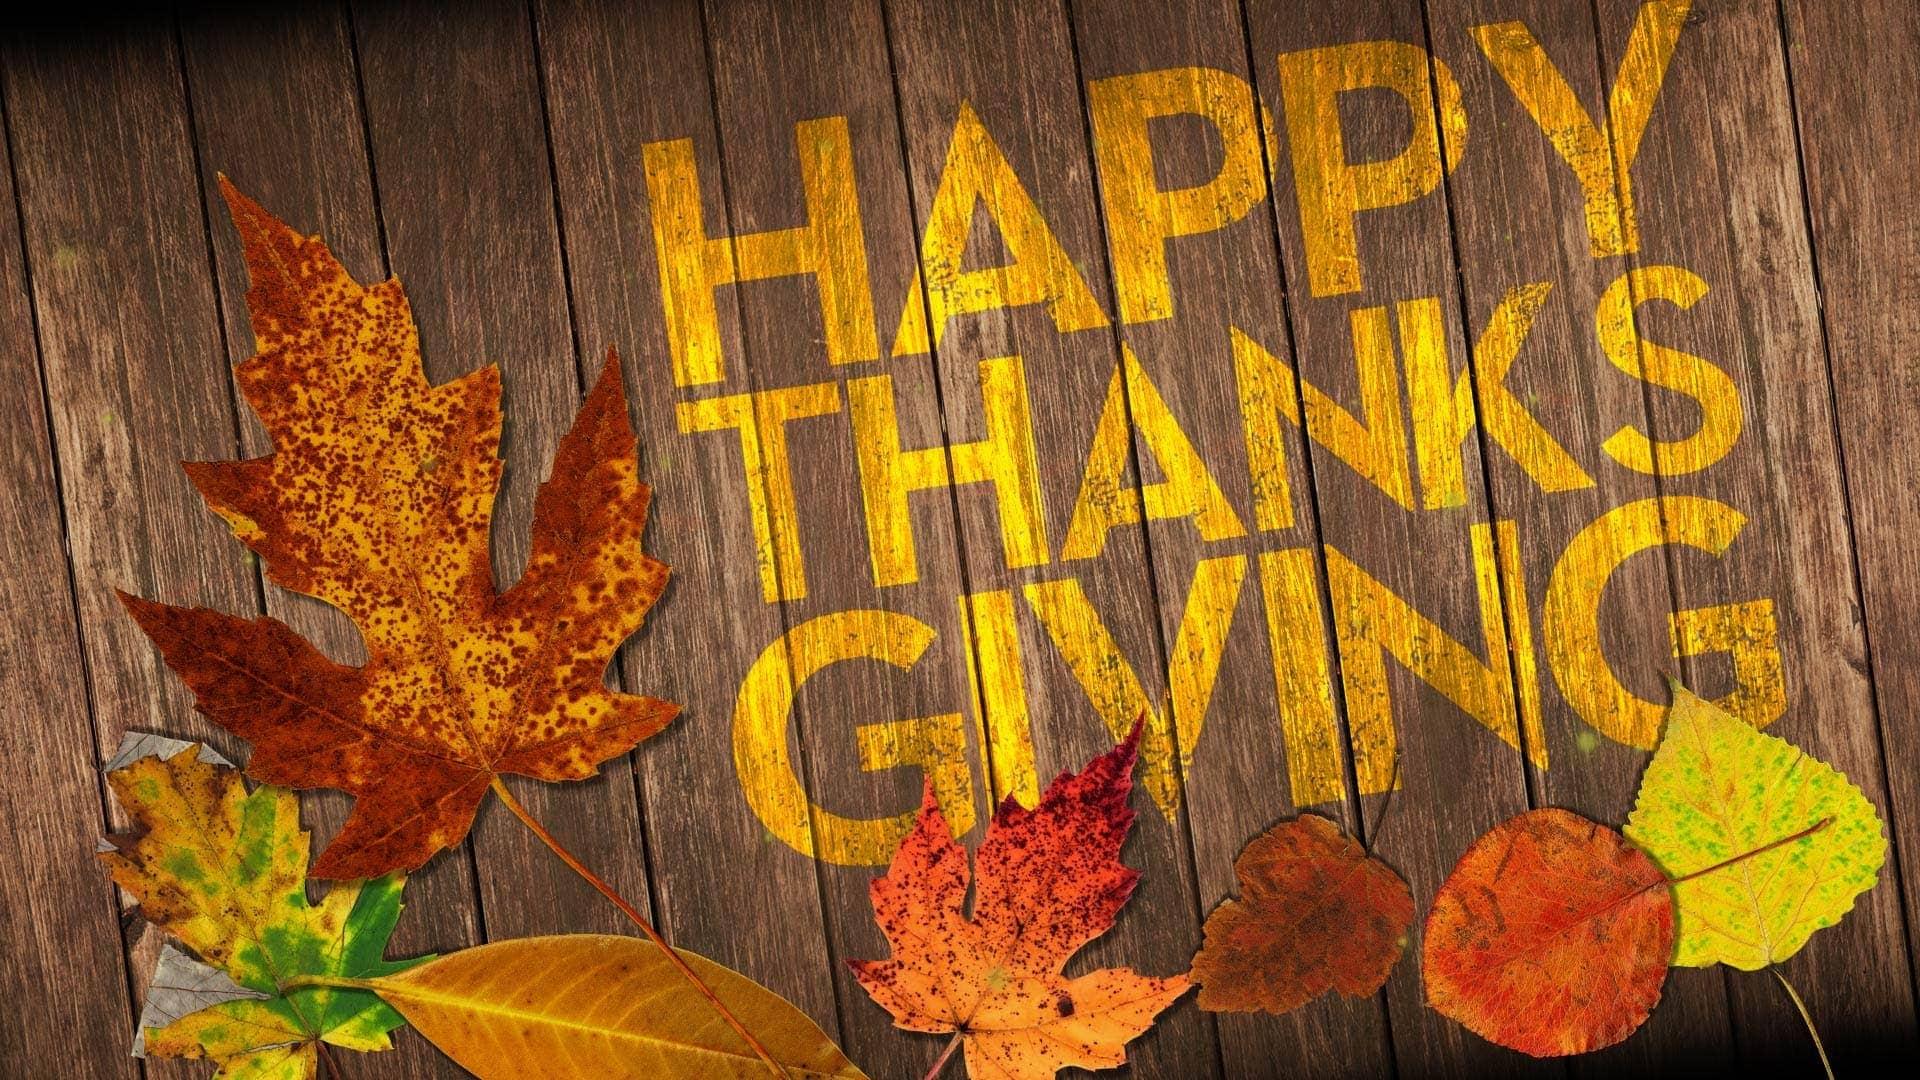 Make Your Thanksgiving Gathering Mindful